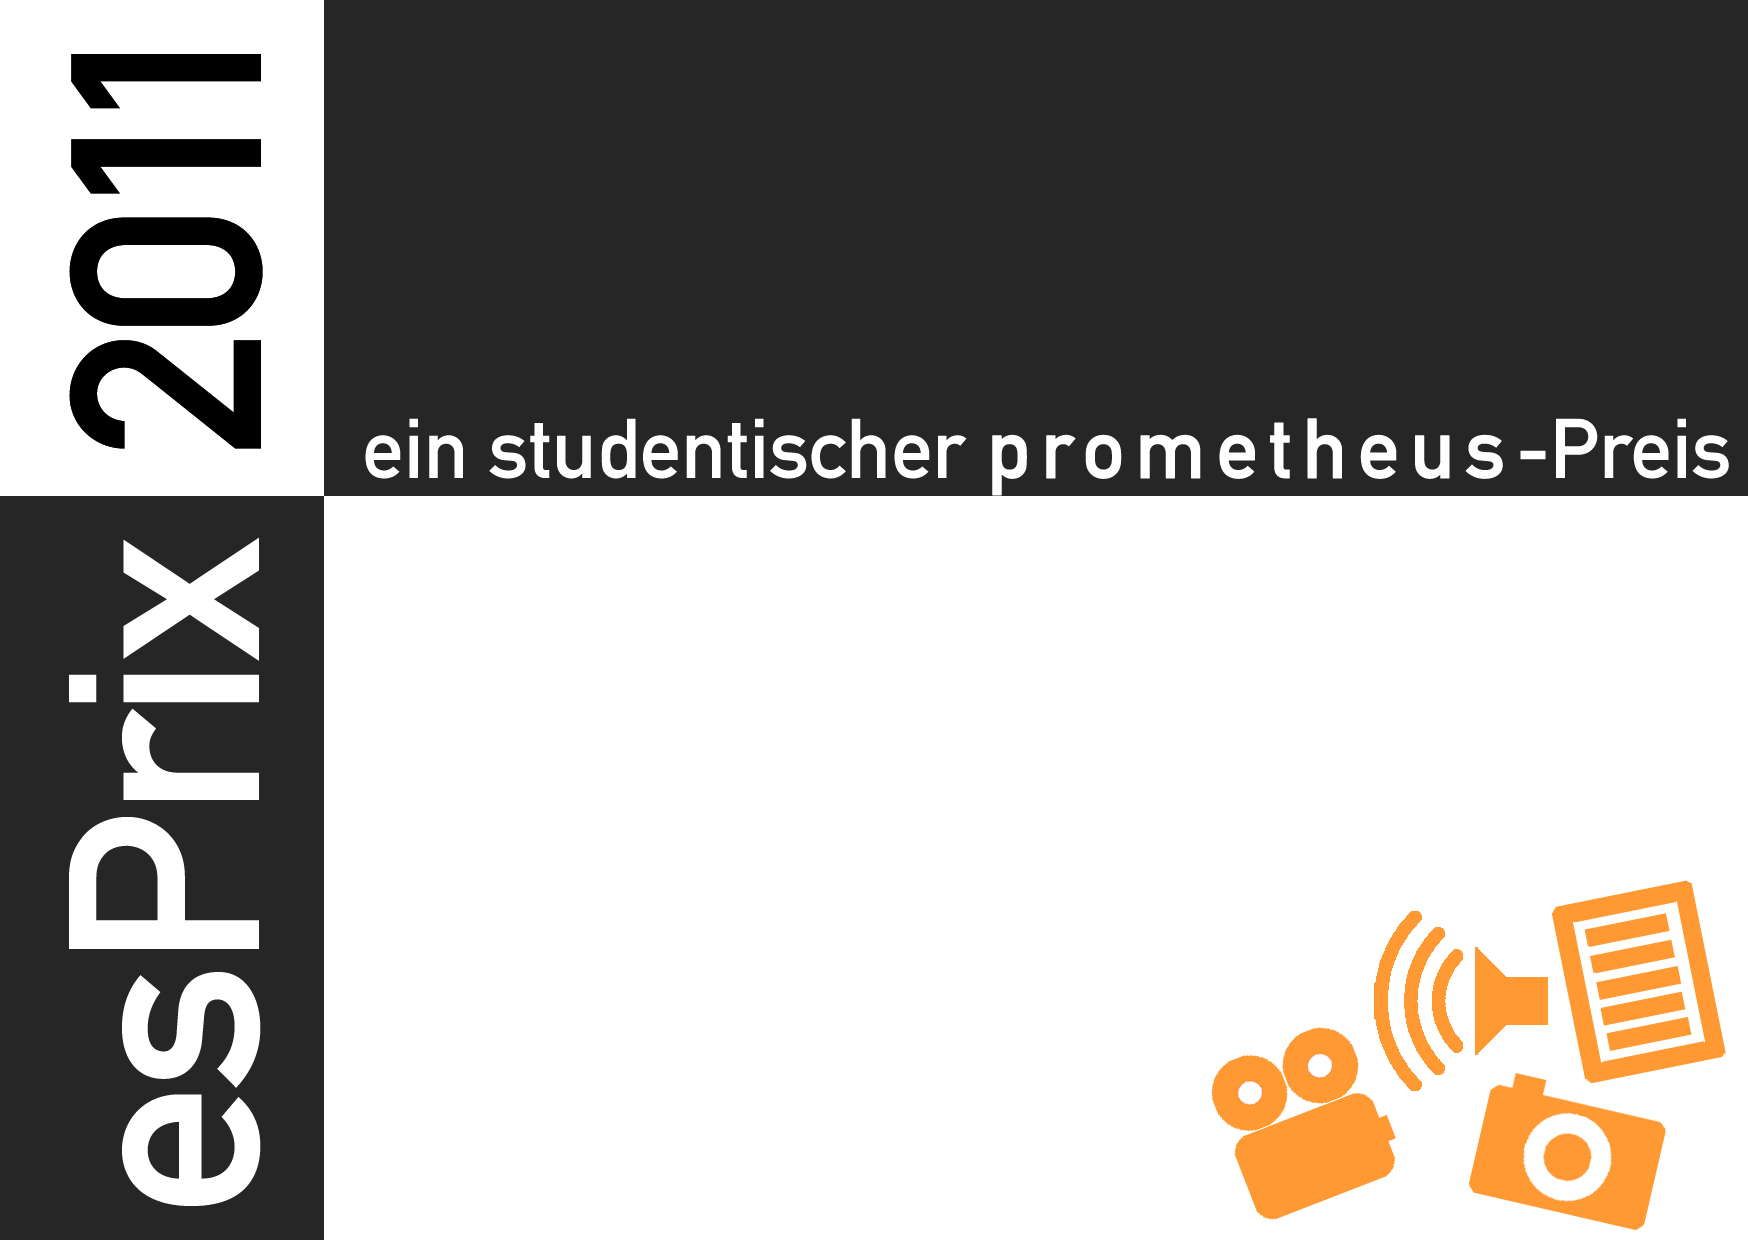 Esprix 2011 German The Prometheus Image Archive High Quality